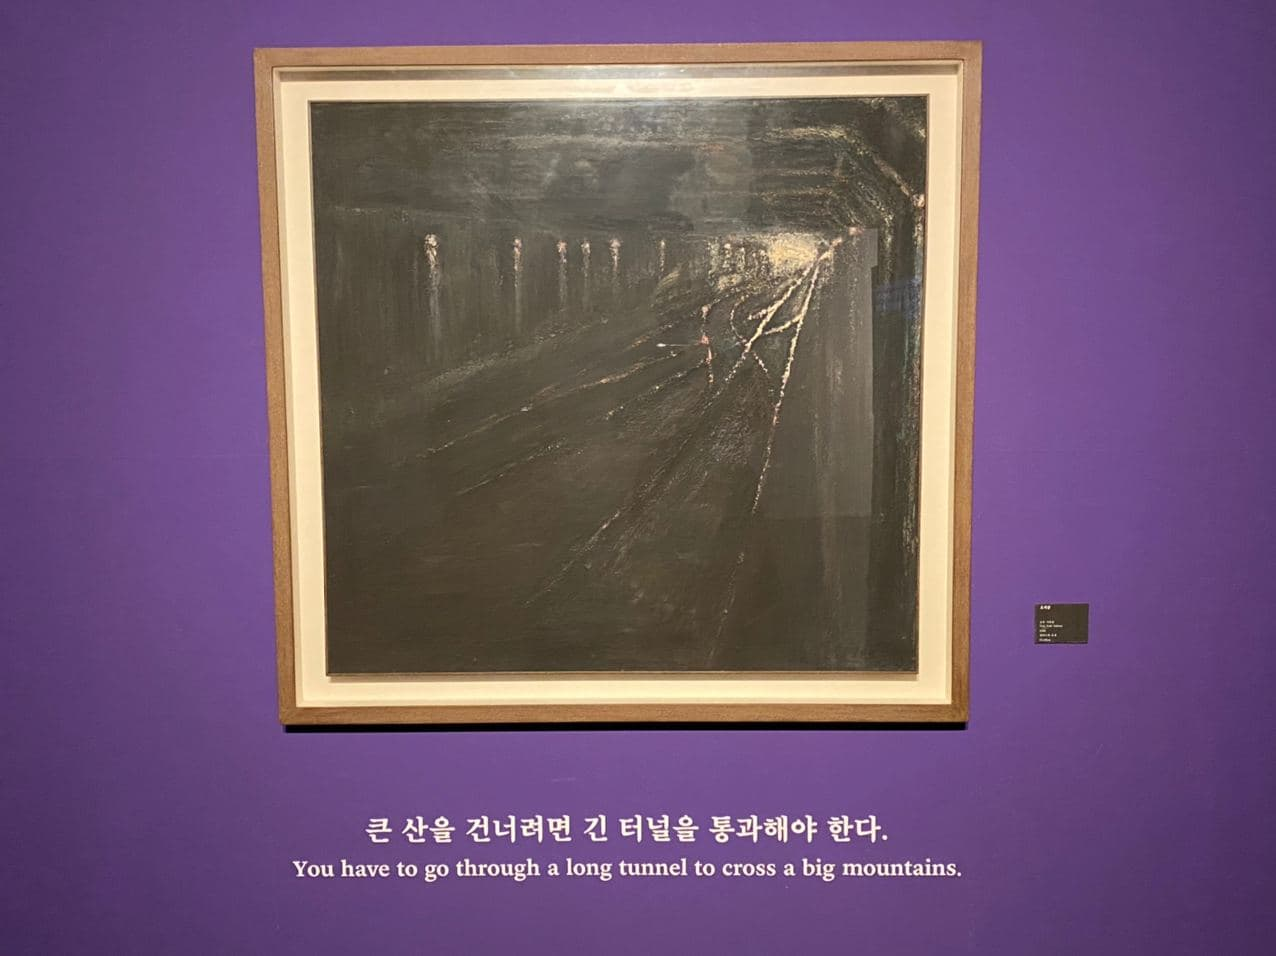 photo_2020-11-12_21-21-43.jpg